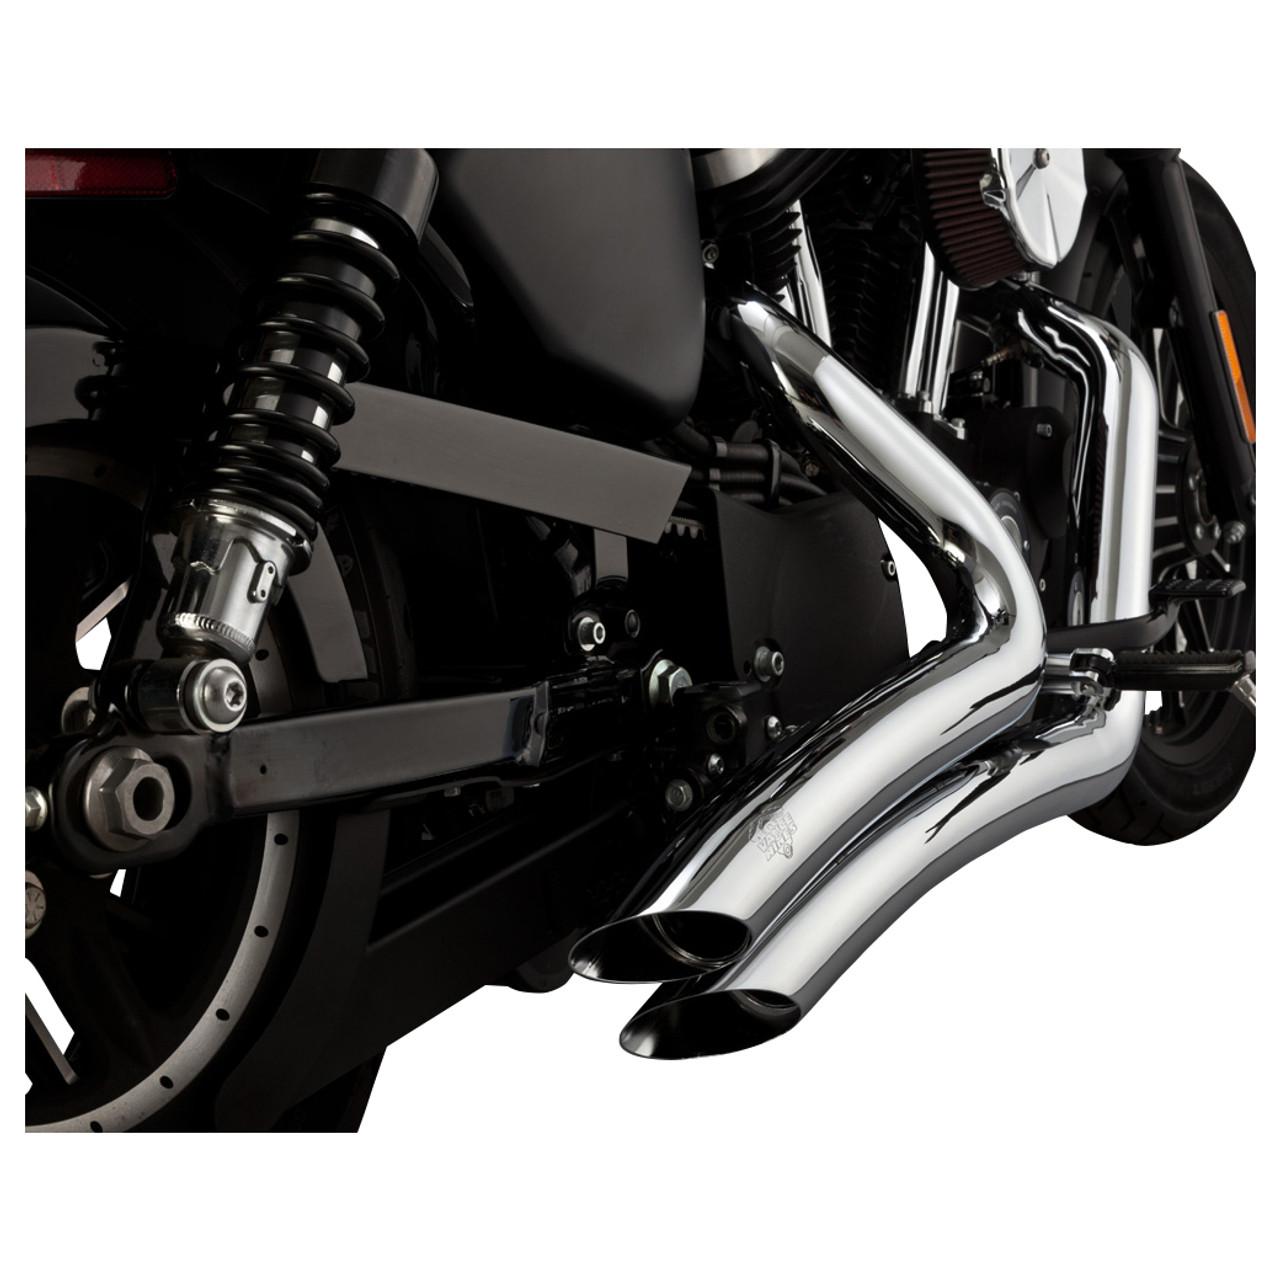 vance hines 26067 chrome big radius exhaust system sportster 14 20